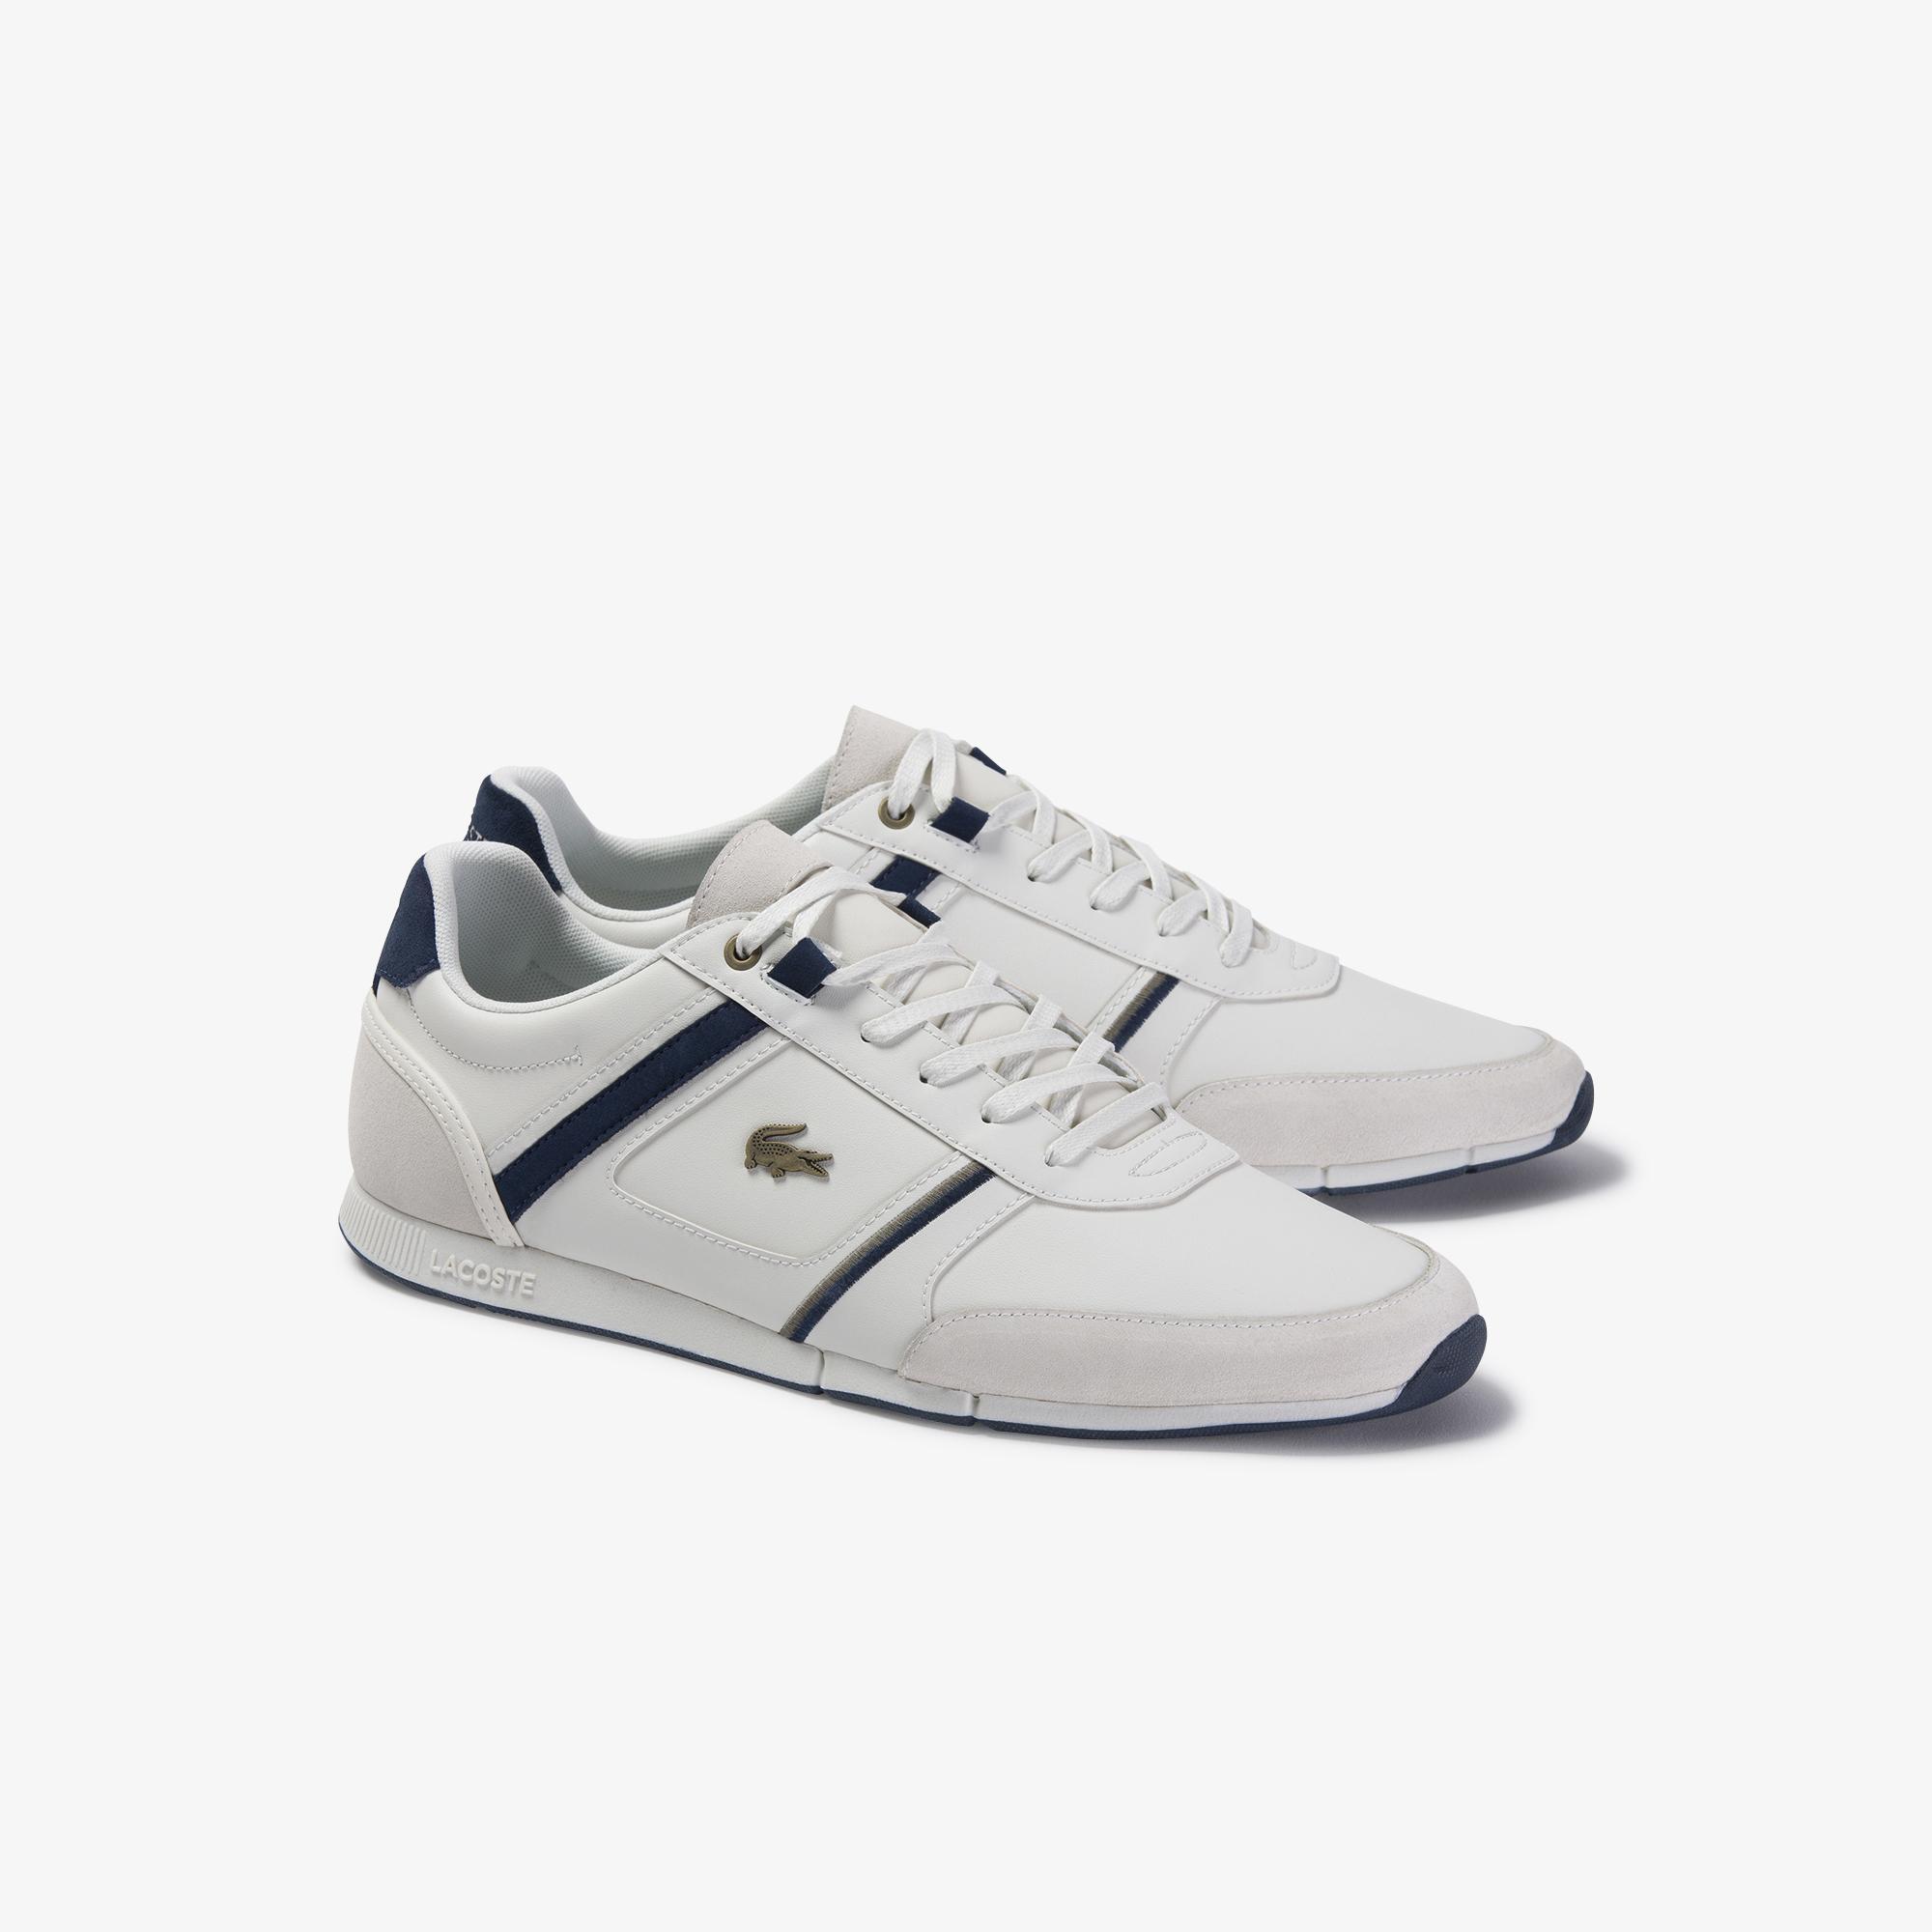 Lacoste Menerva 120 1 Męskie Sneakersy